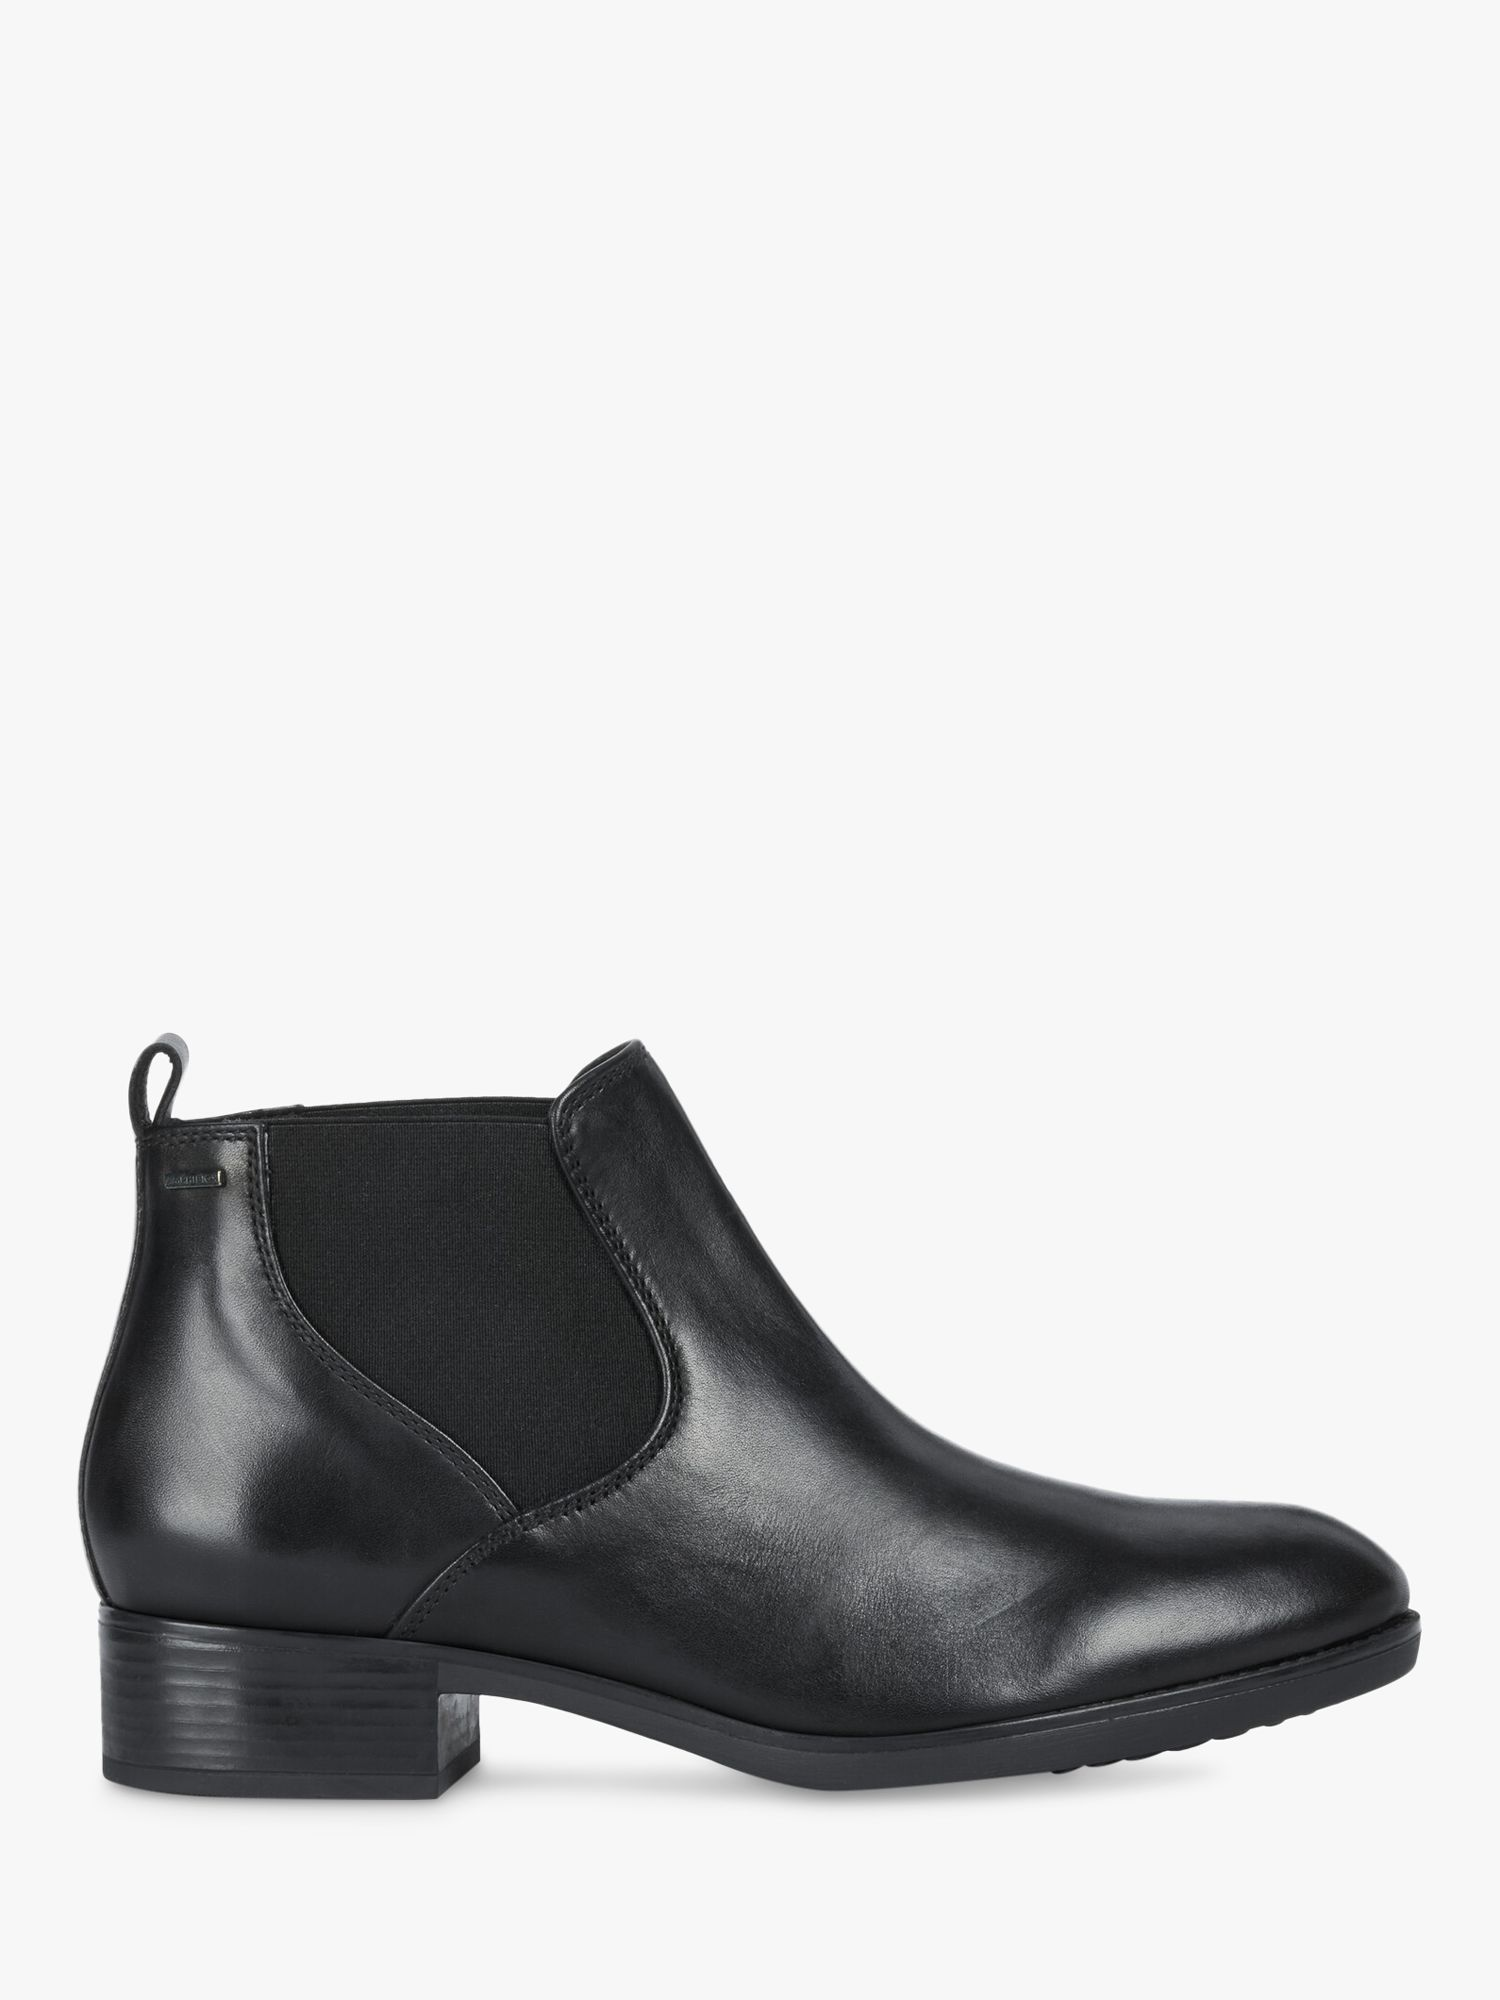 Geox Geox Women's Felicity Leather Chelsea Boots, Black